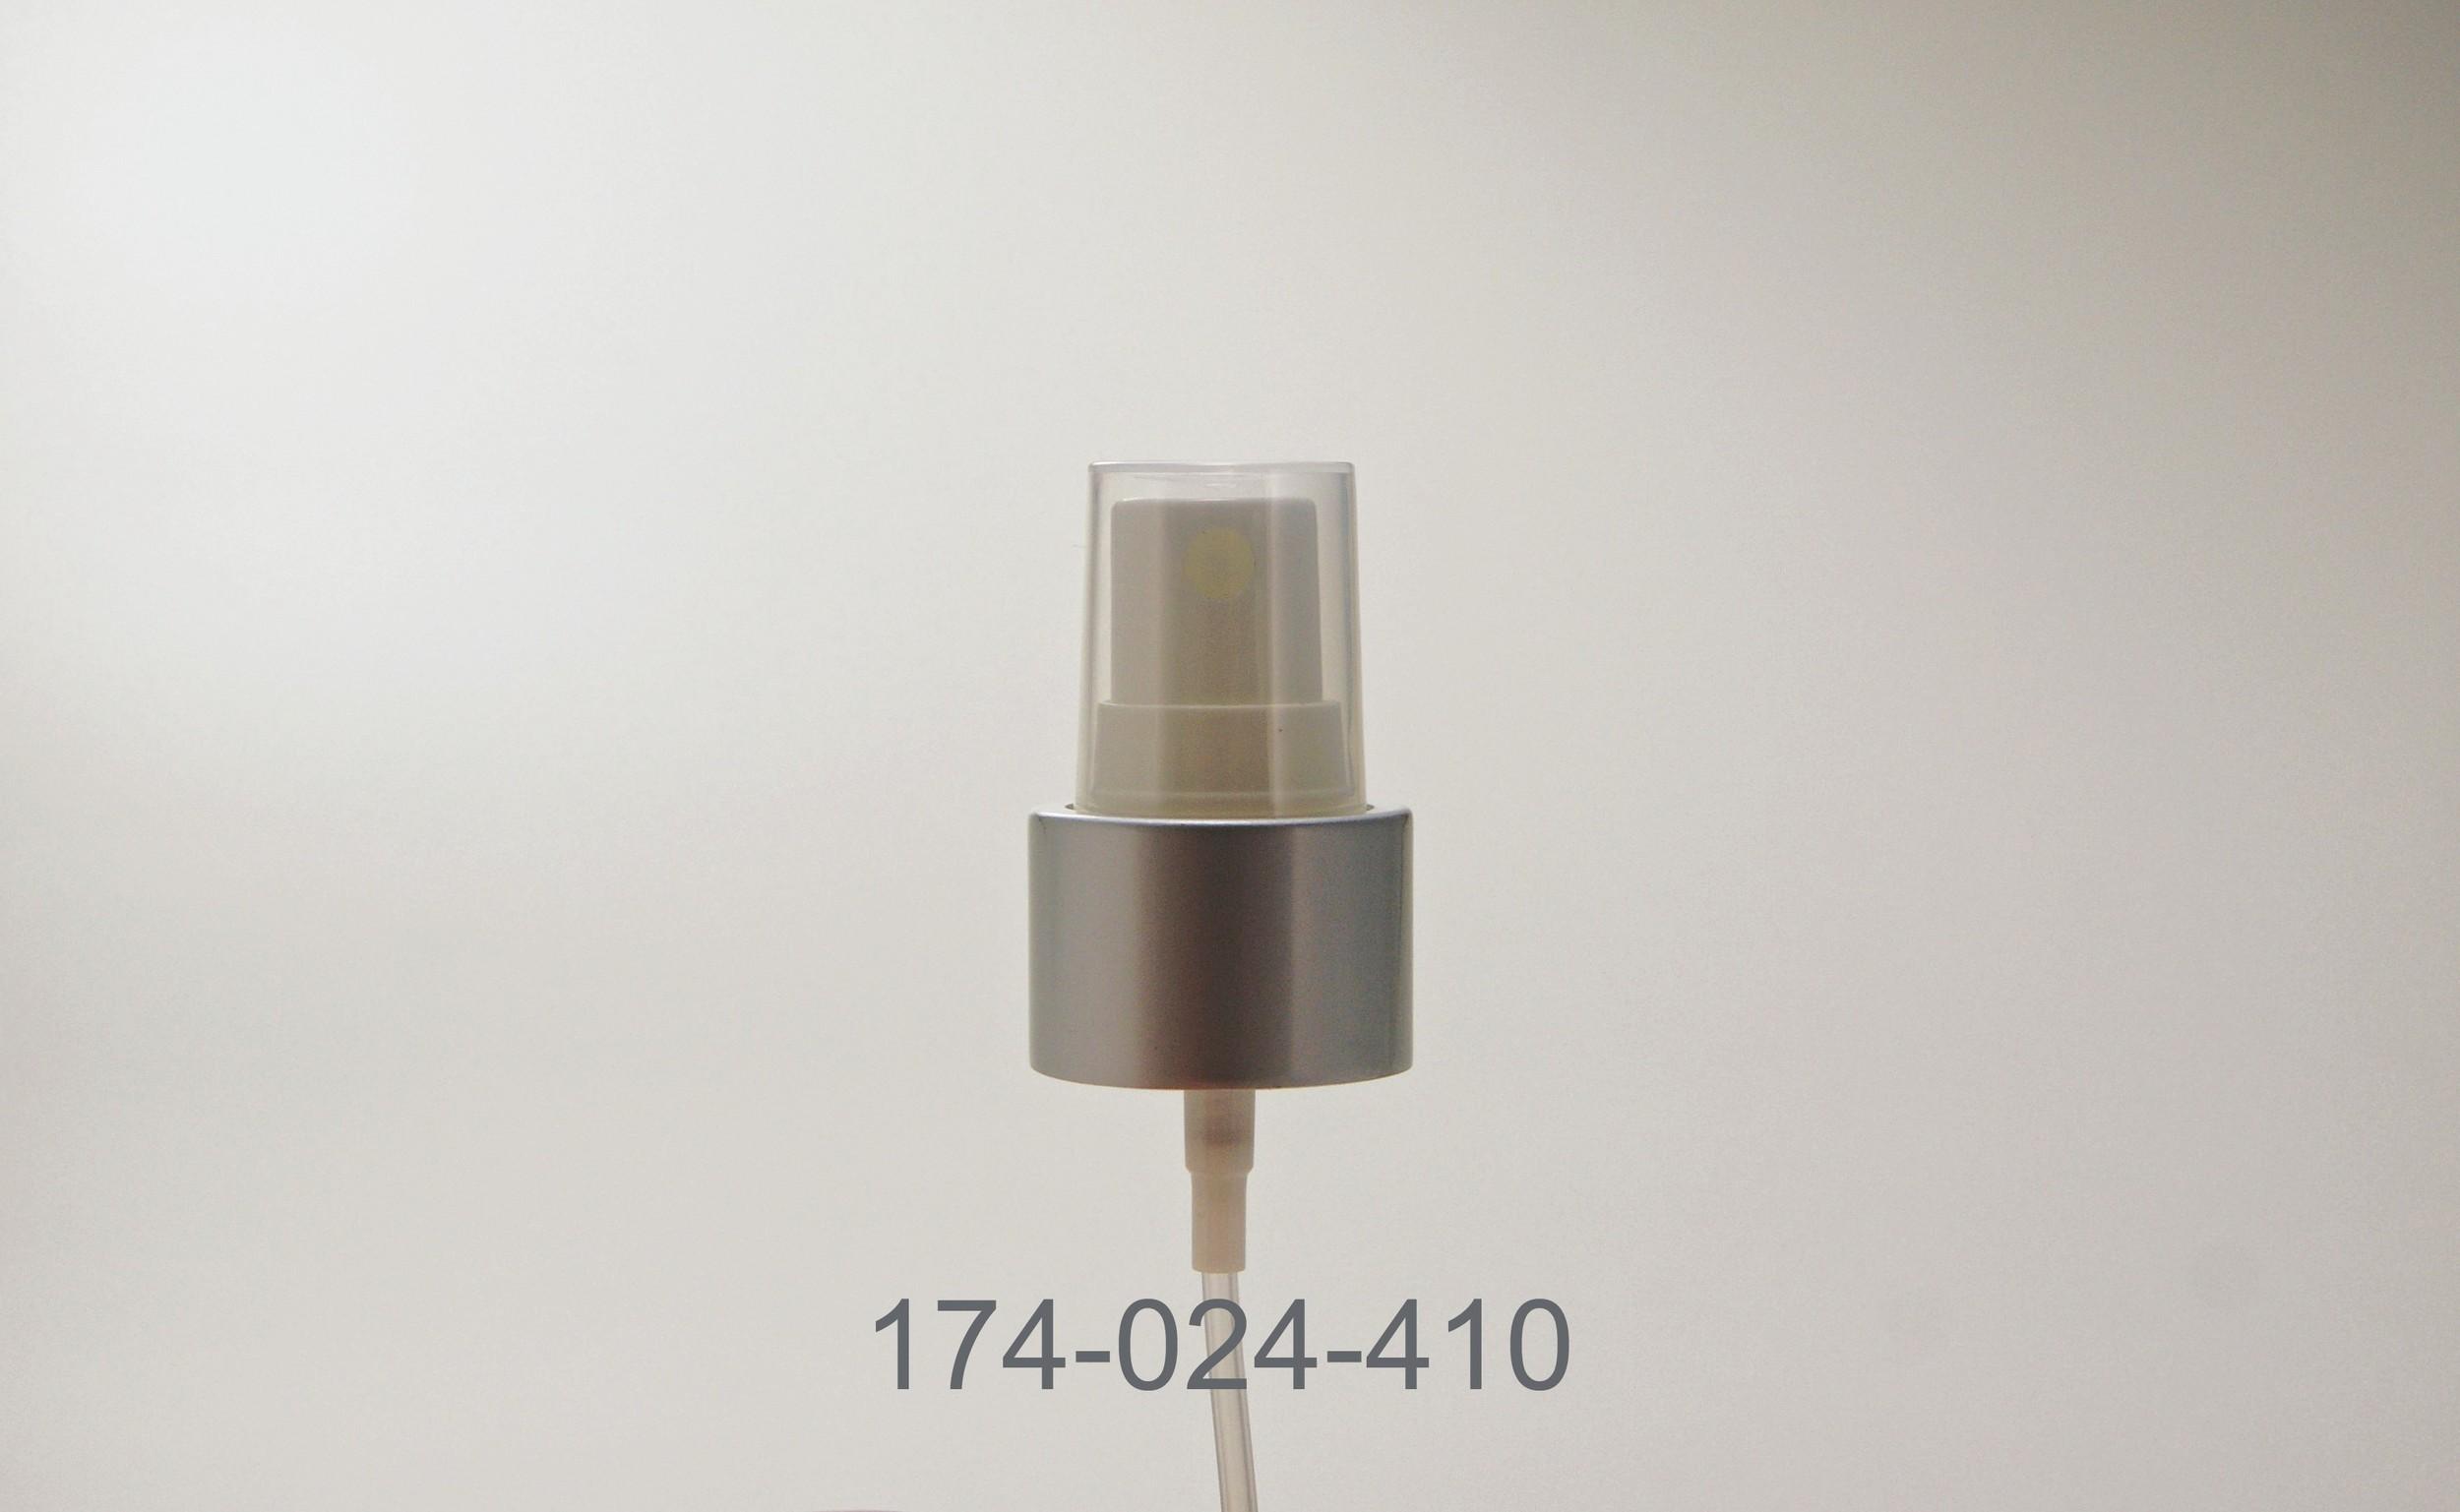 174-024-410 ms.jpg